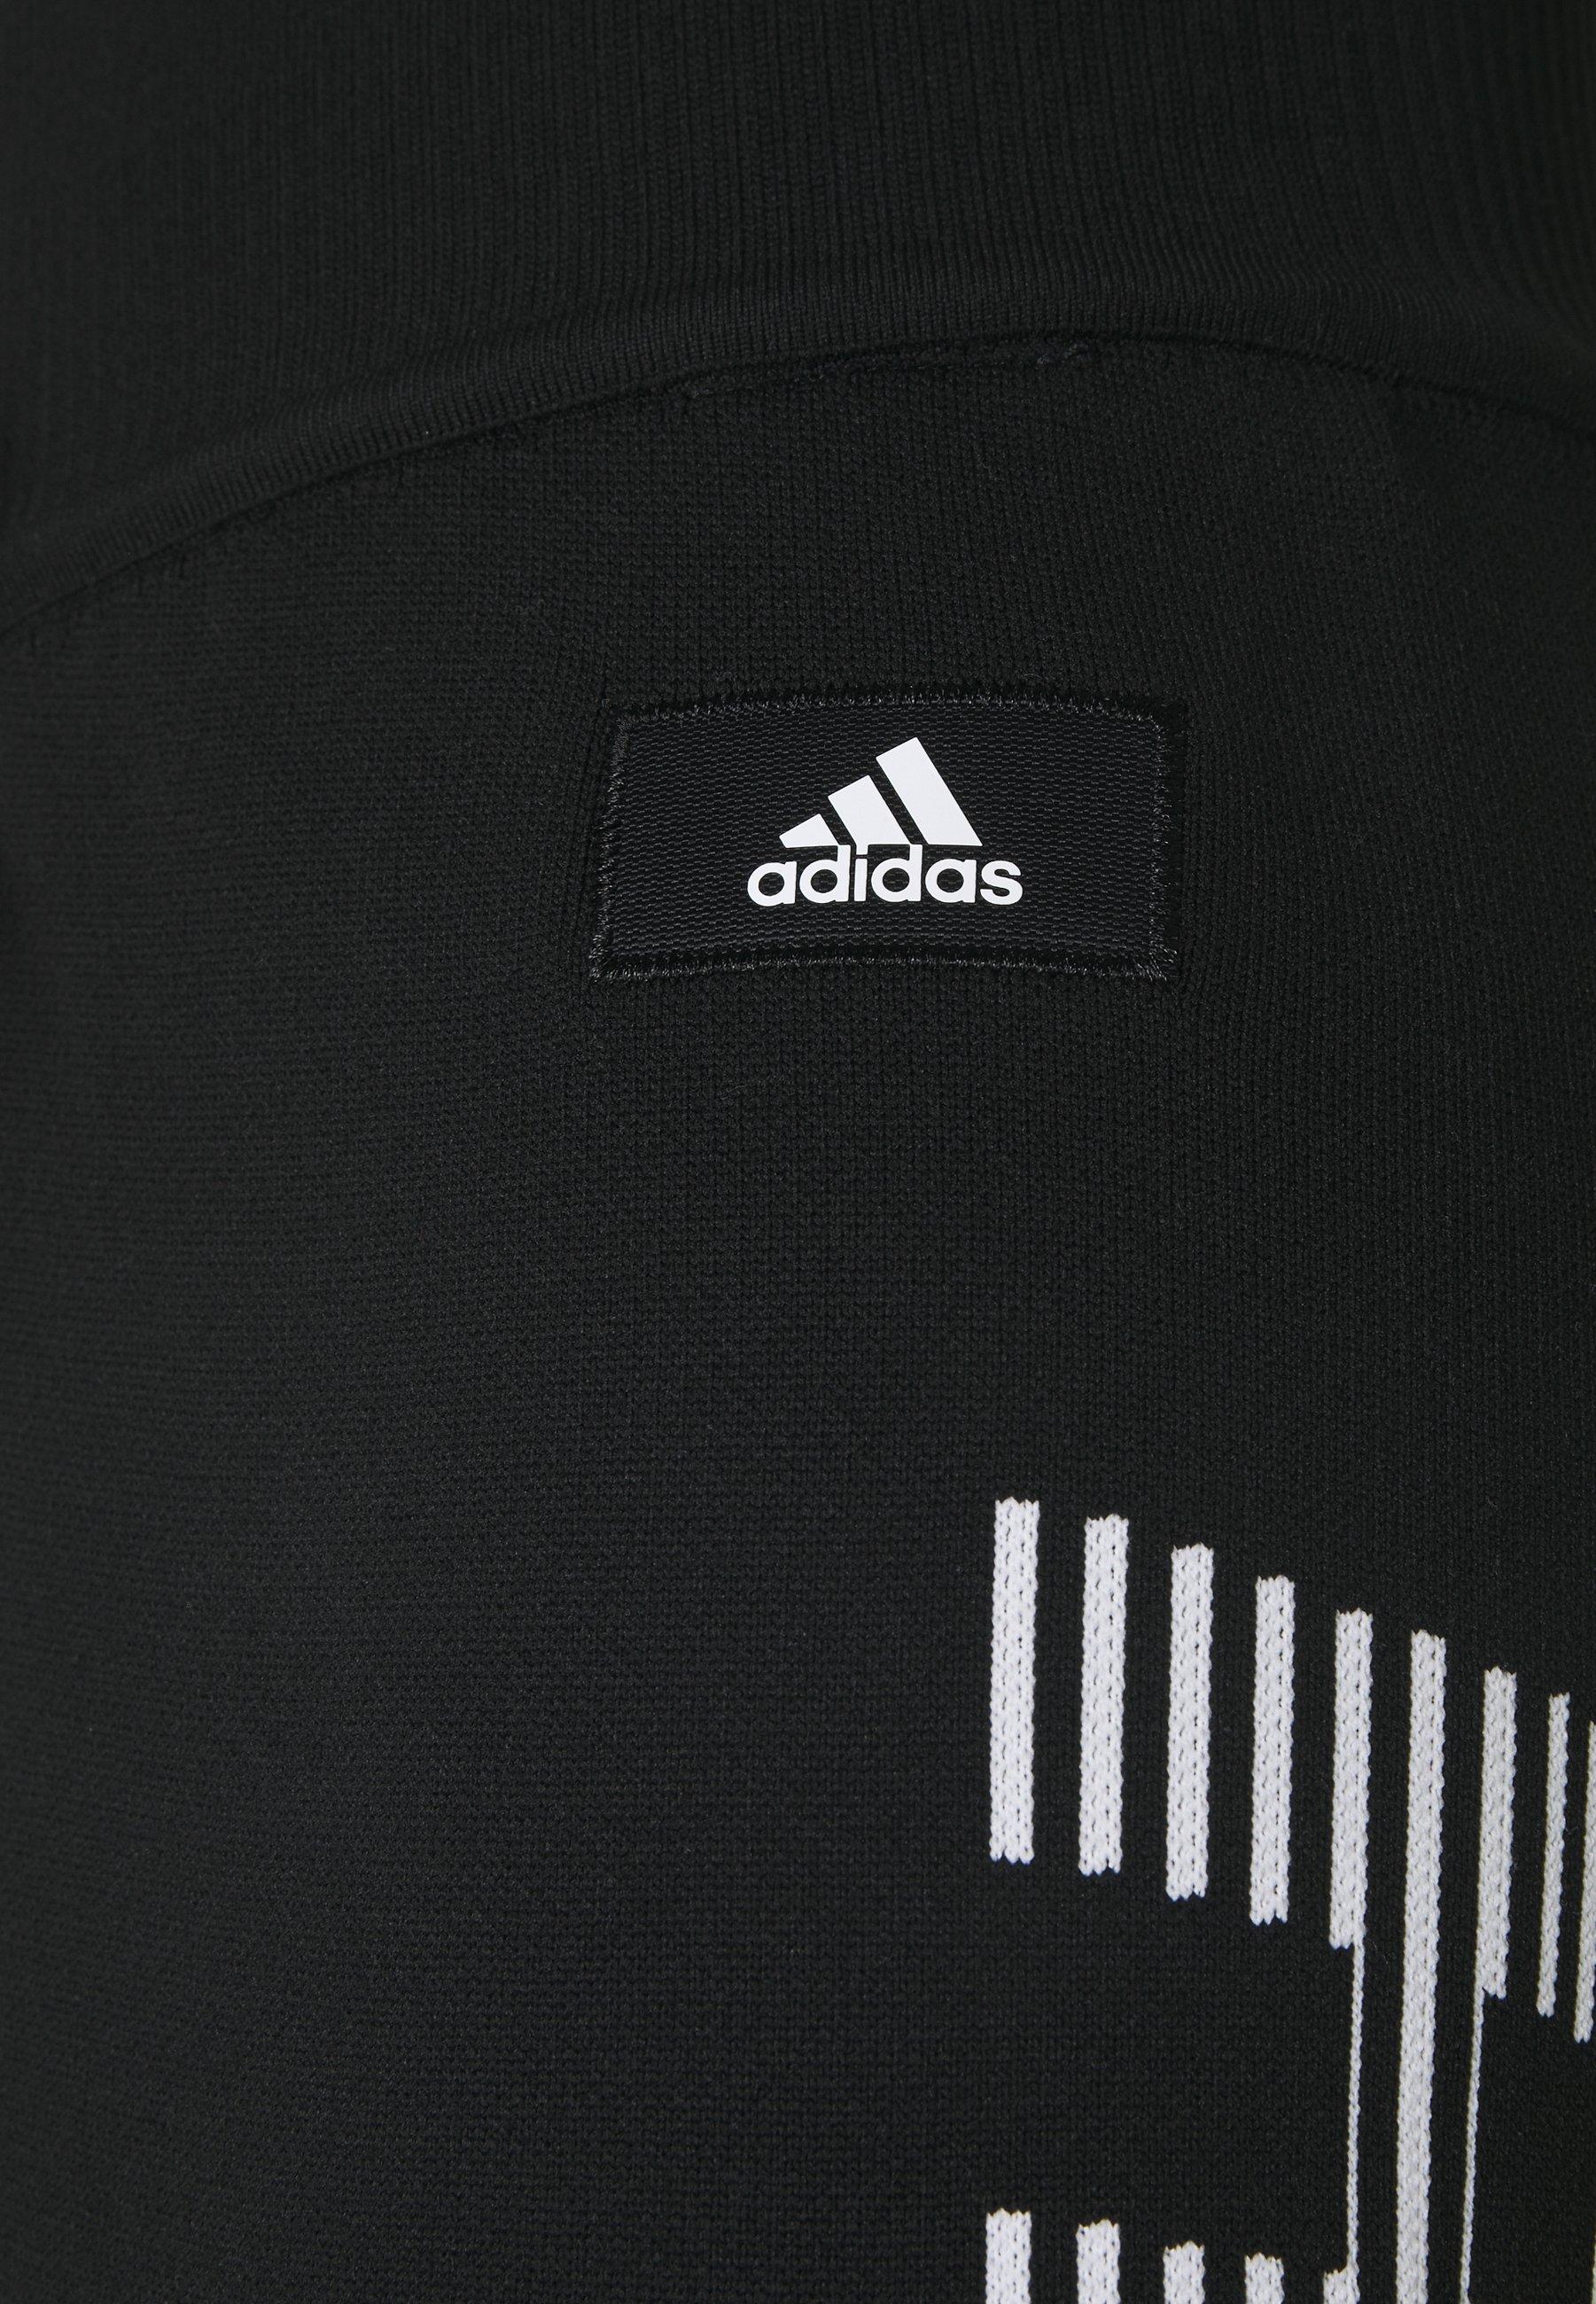 adidas Performance Tracksuit bottoms - black QK260